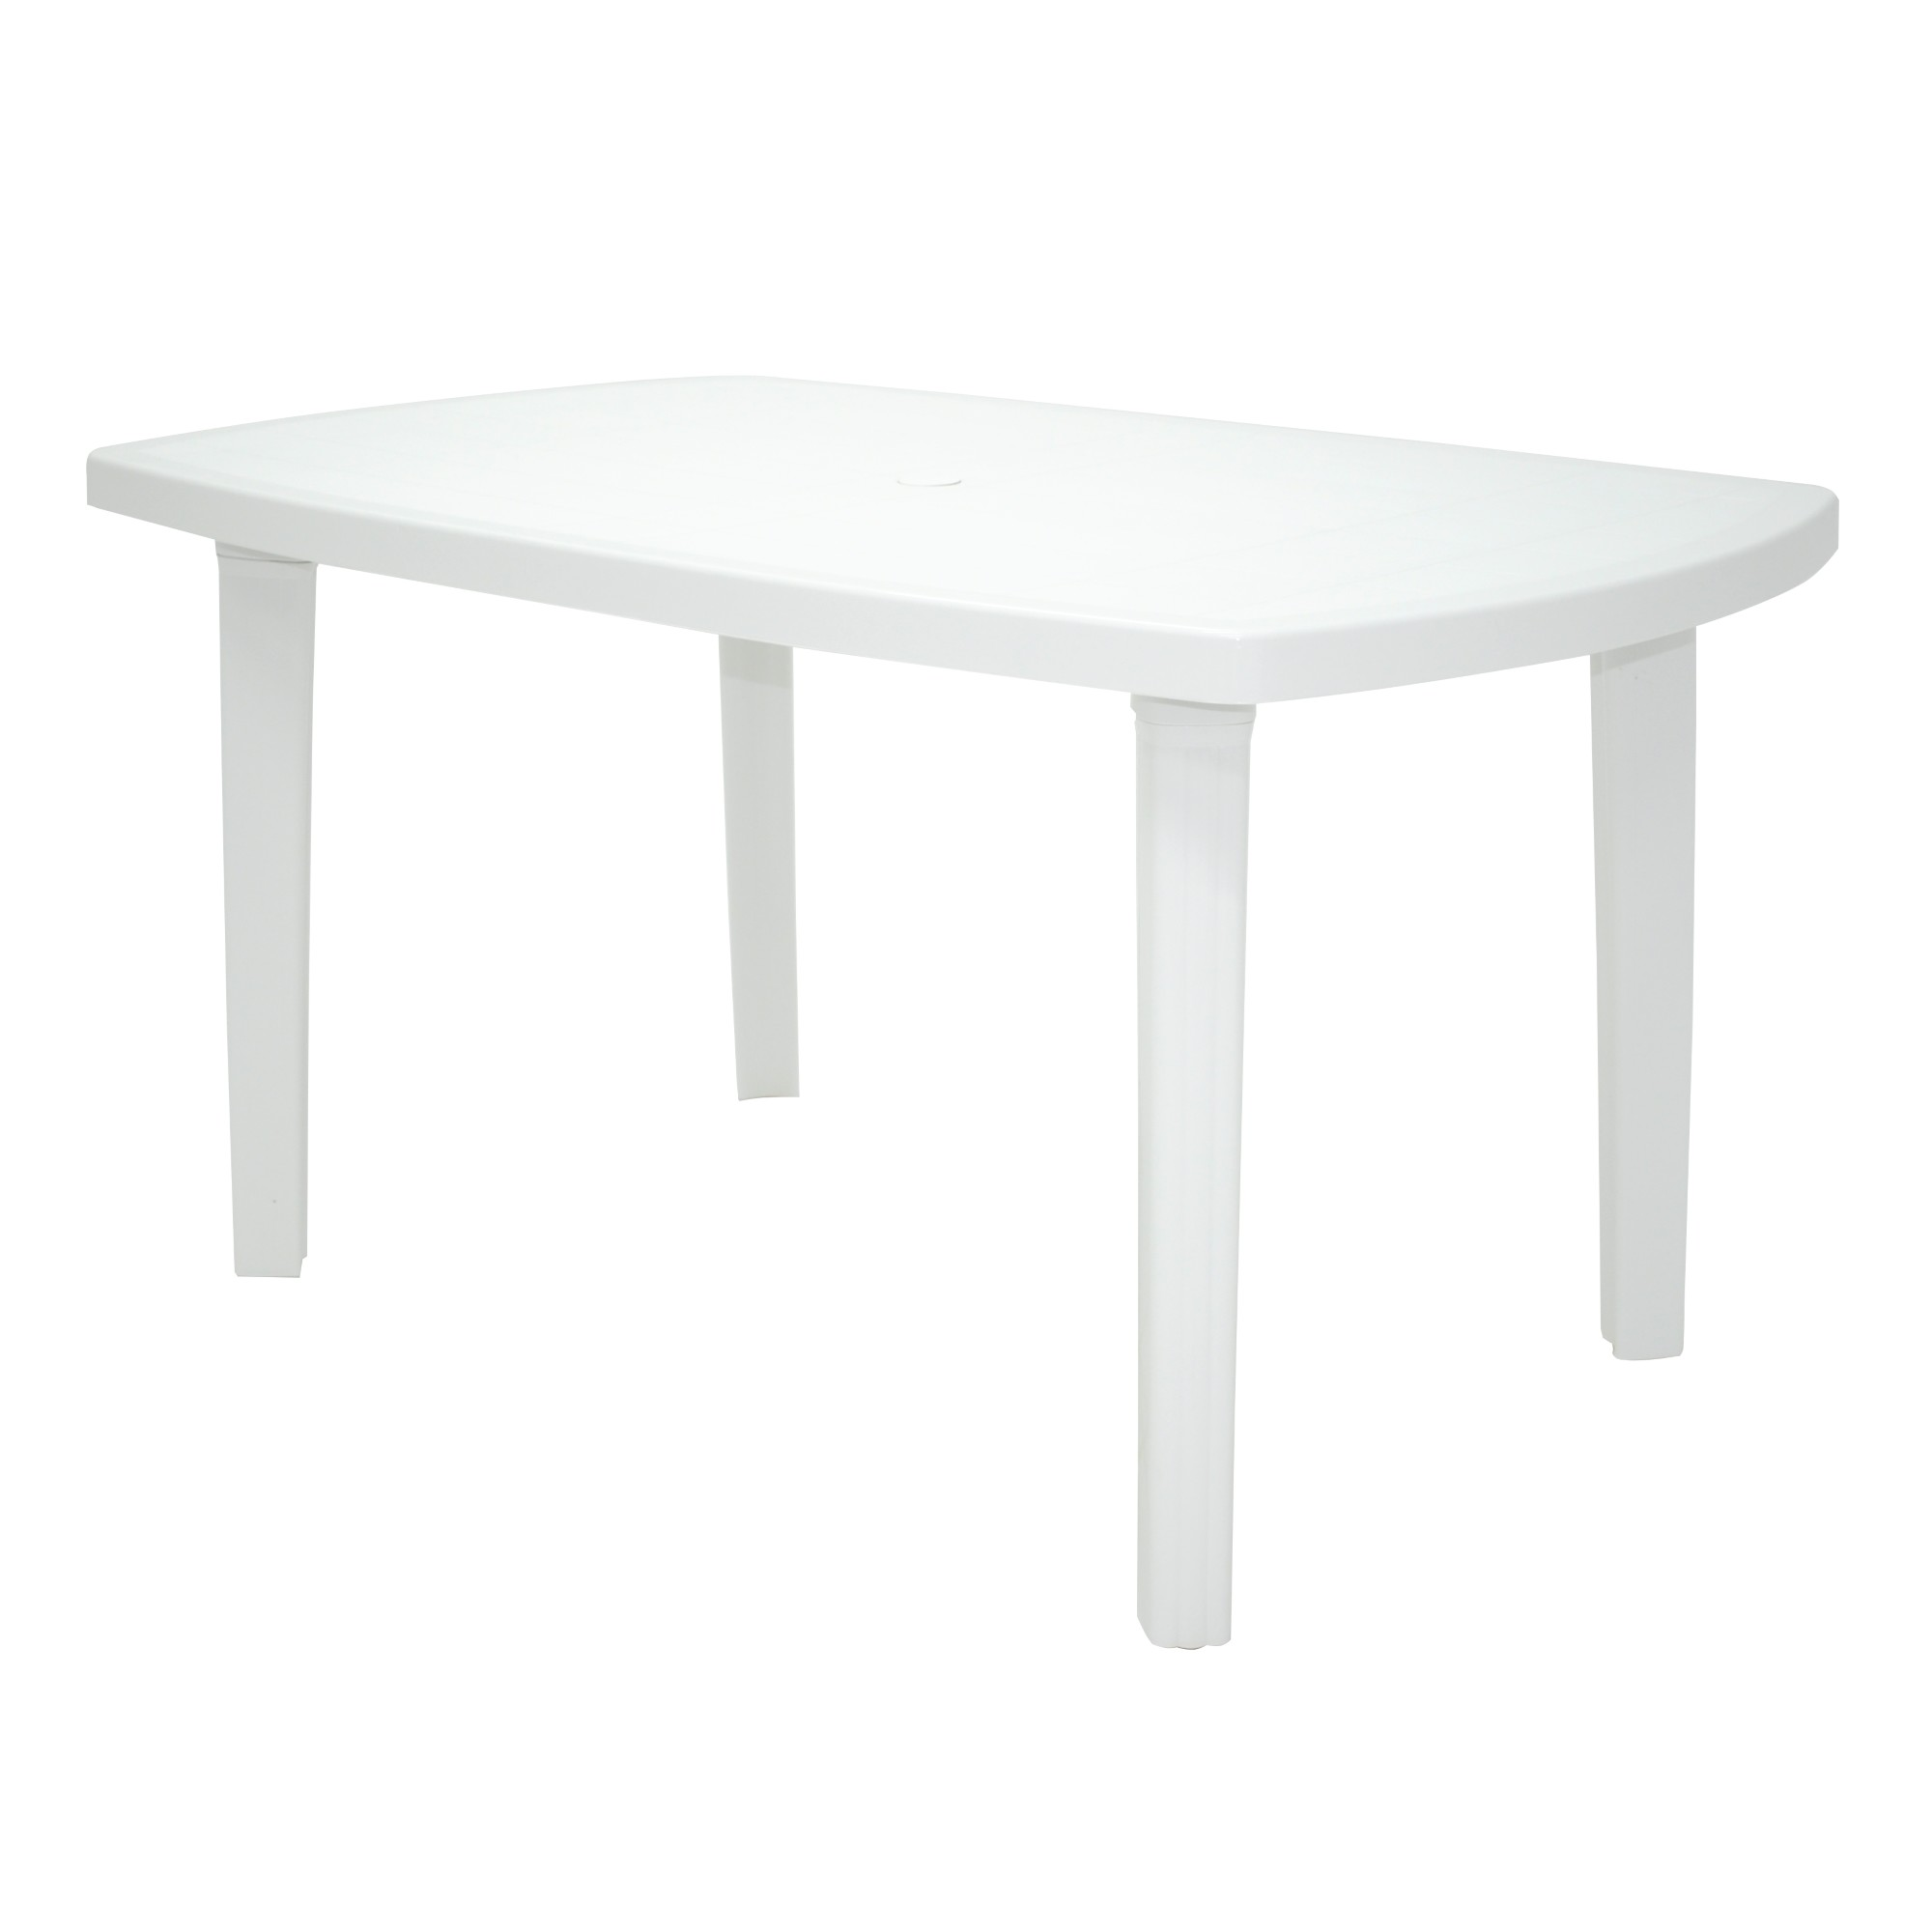 Mesa de Plastico Retangular 136x90cm Camboriu Branca - Tramontina